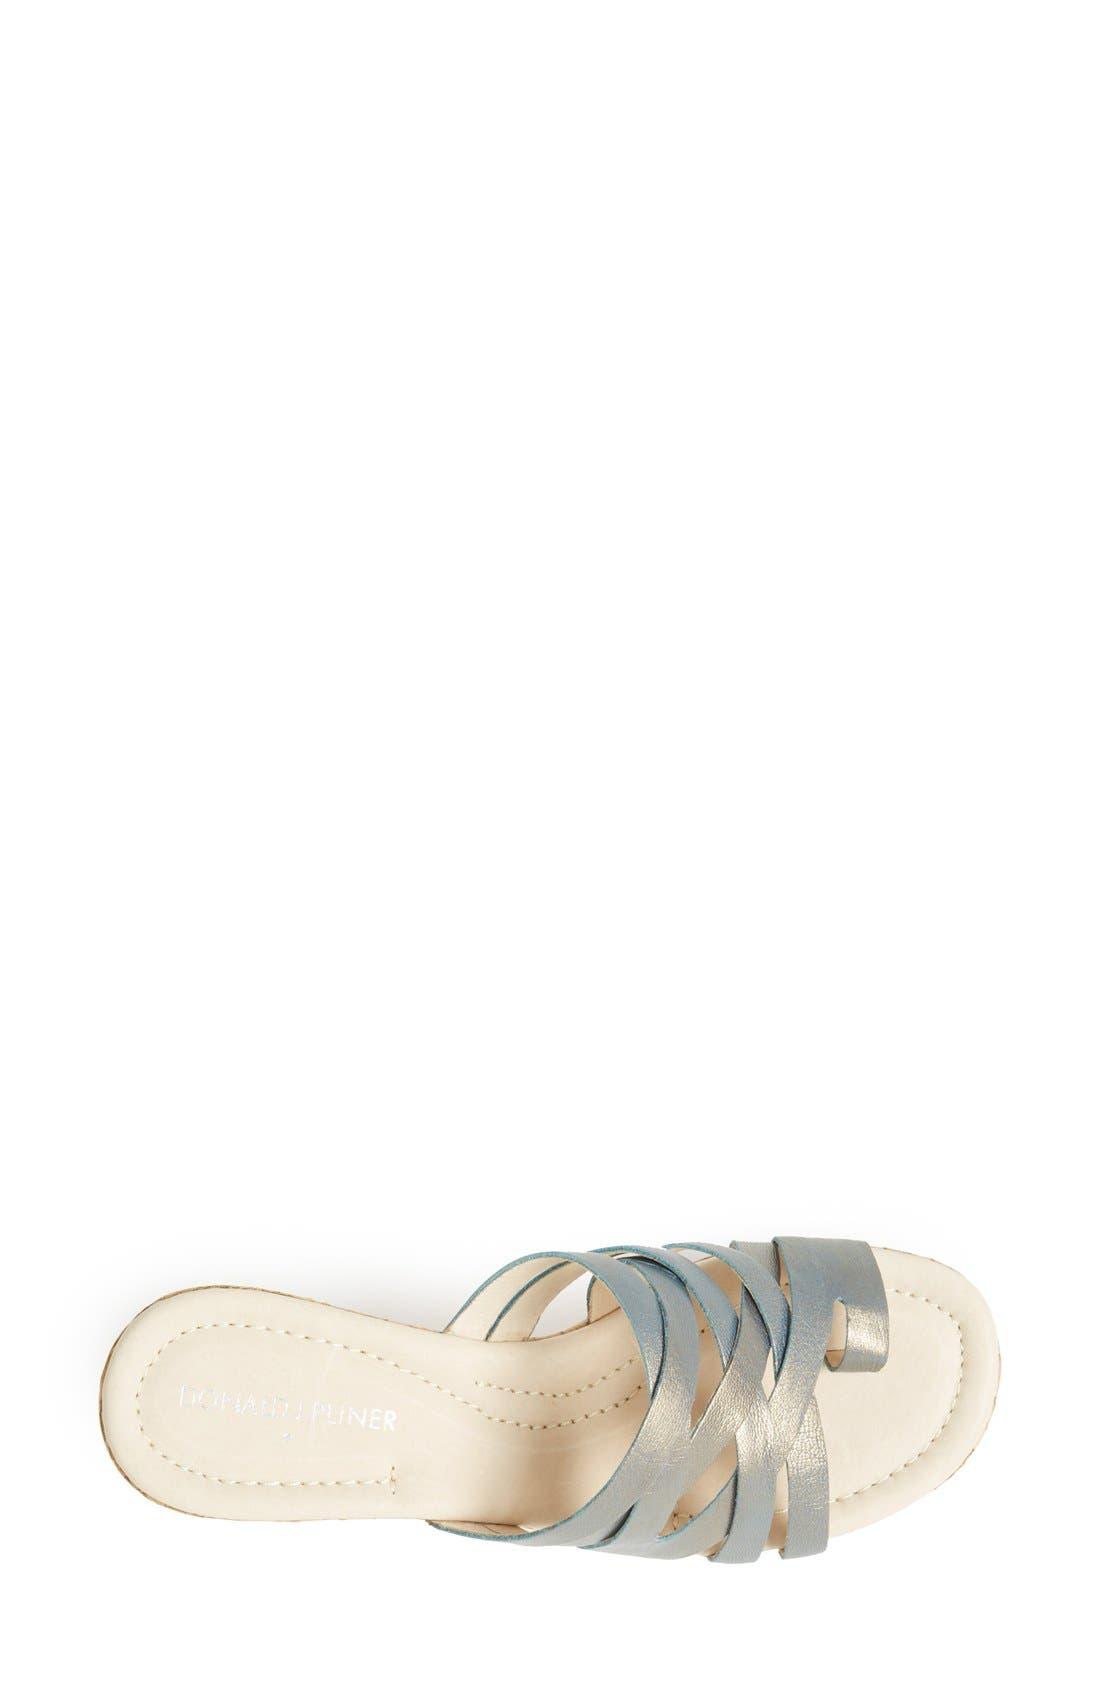 Alternate Image 3  - Donald J Pliner 'Salma' Sandal